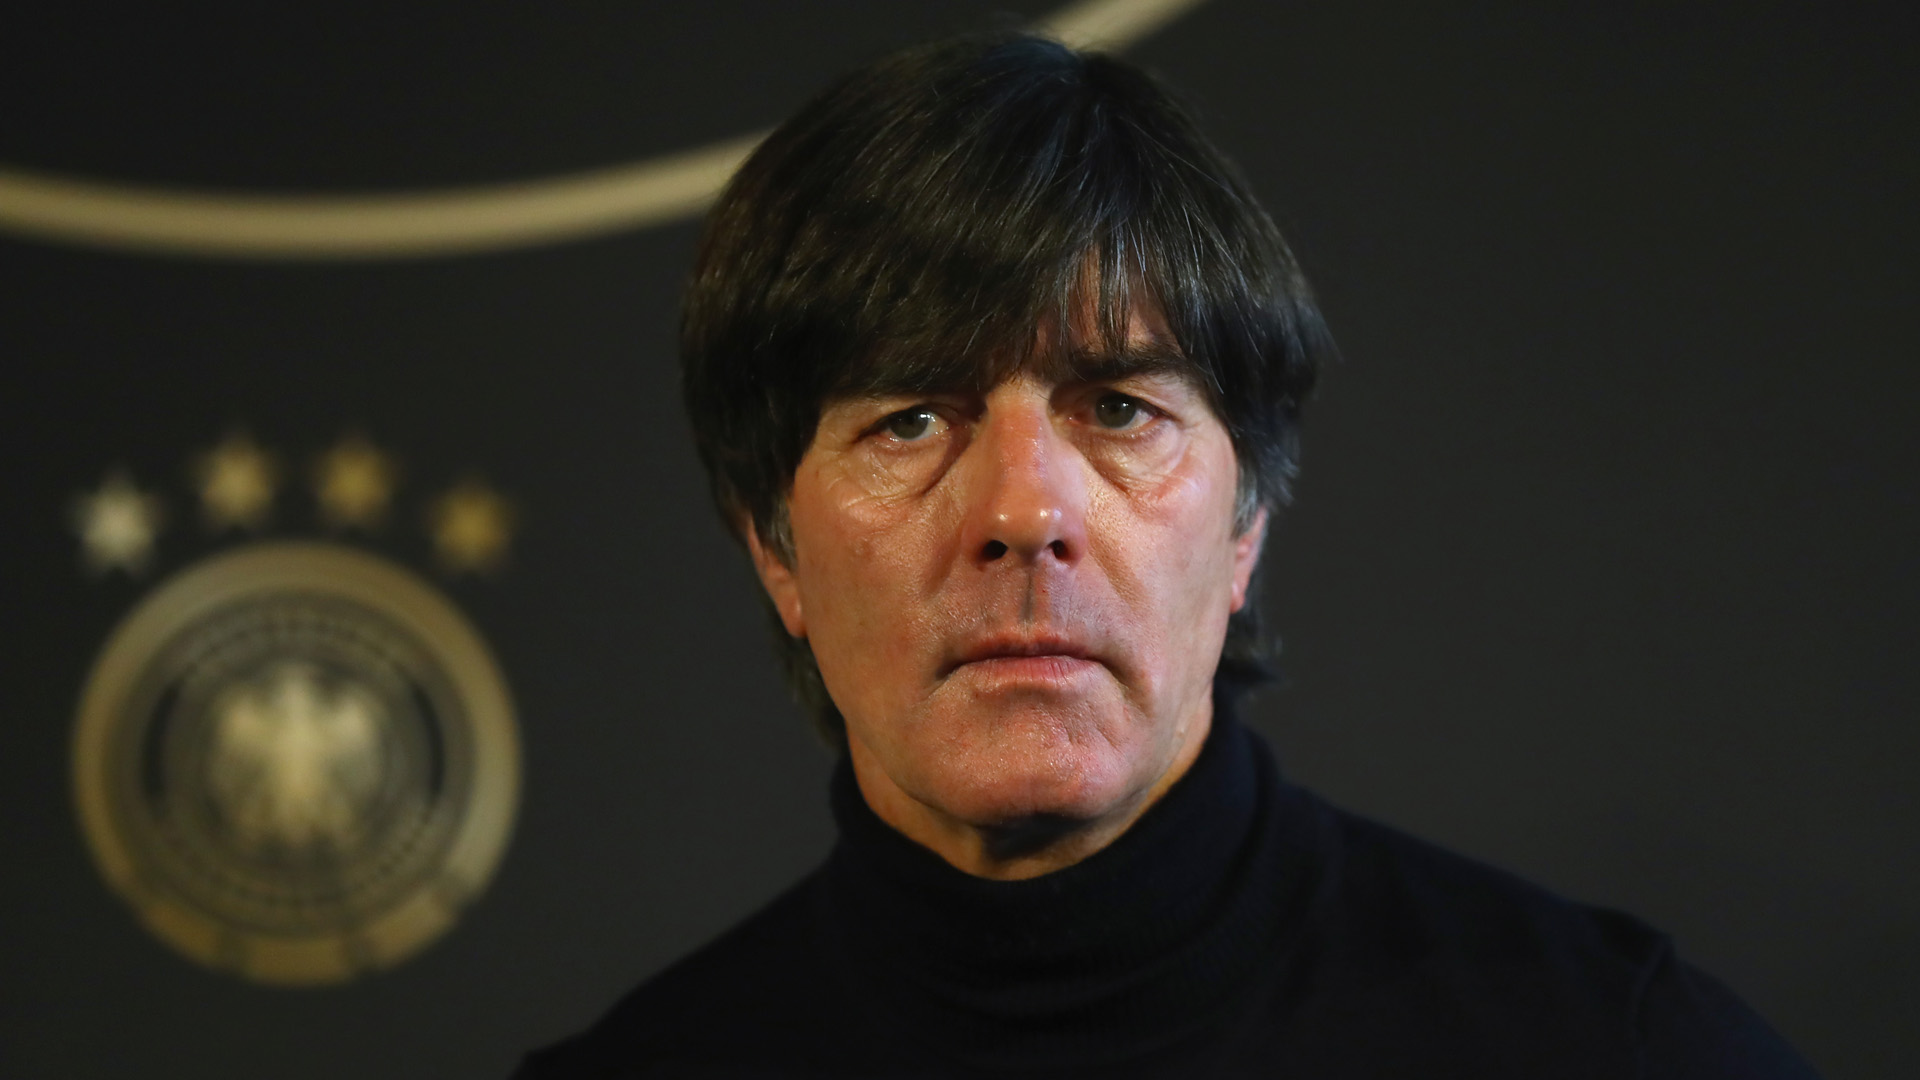 Jupp Heynckes plant Comeback von Manuel Neuer in Bundesliga